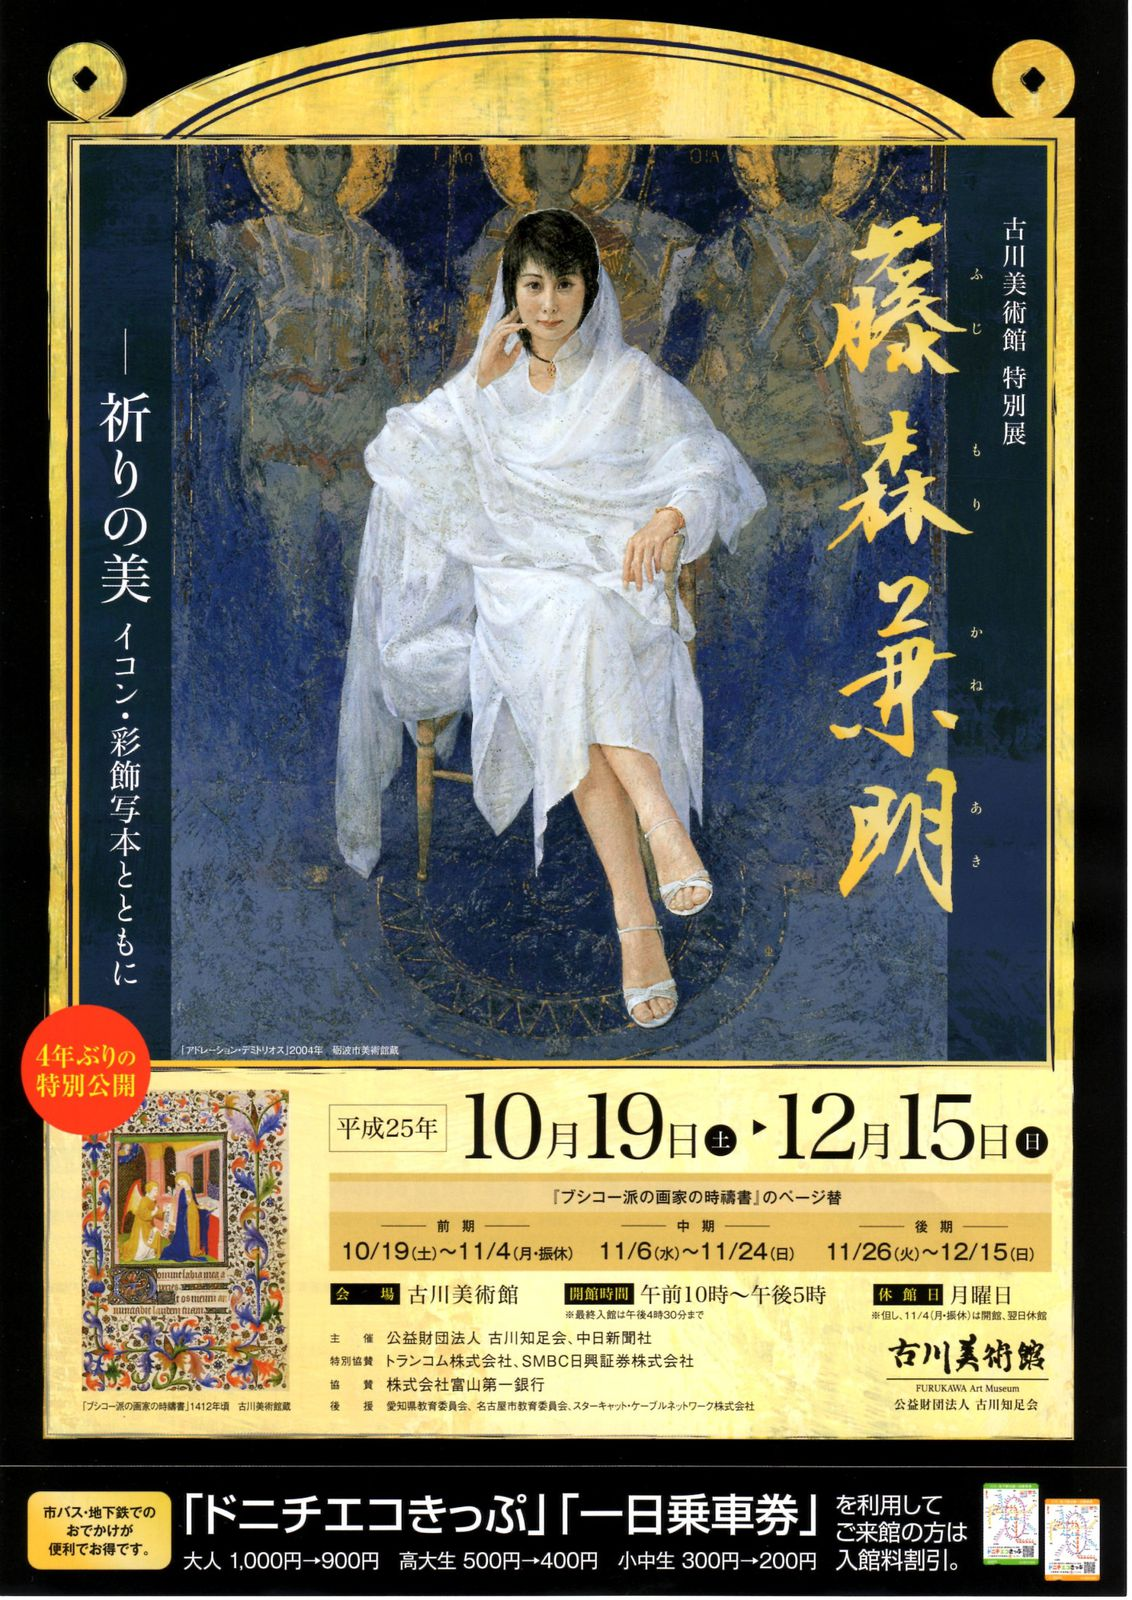 Exposition FUJIMORI Kaneaki